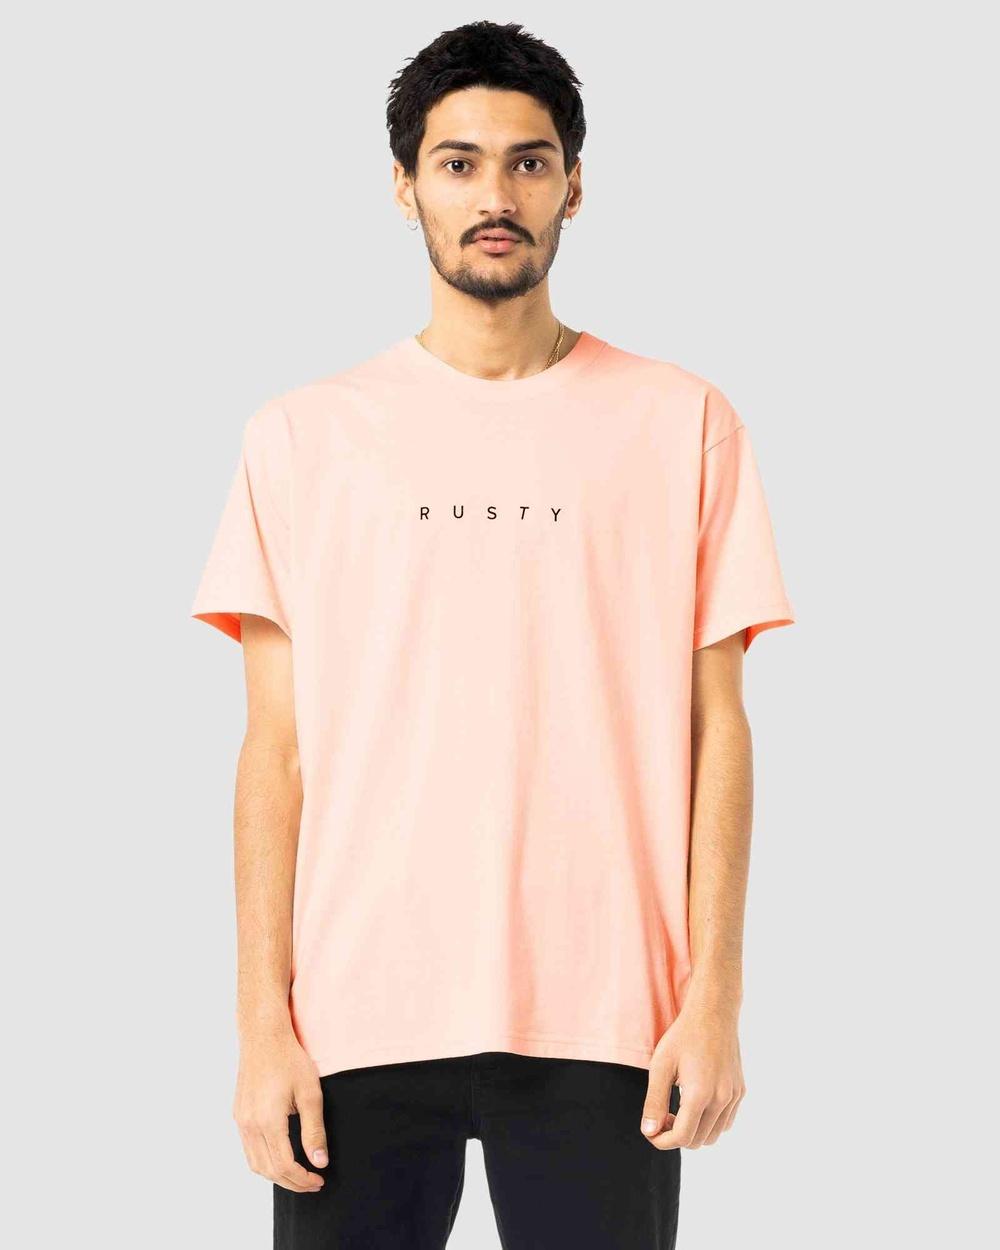 Rusty - Short Cut Short Sleeve Tee - Short Sleeve T-Shirts (PKN) Short Cut Short Sleeve Tee